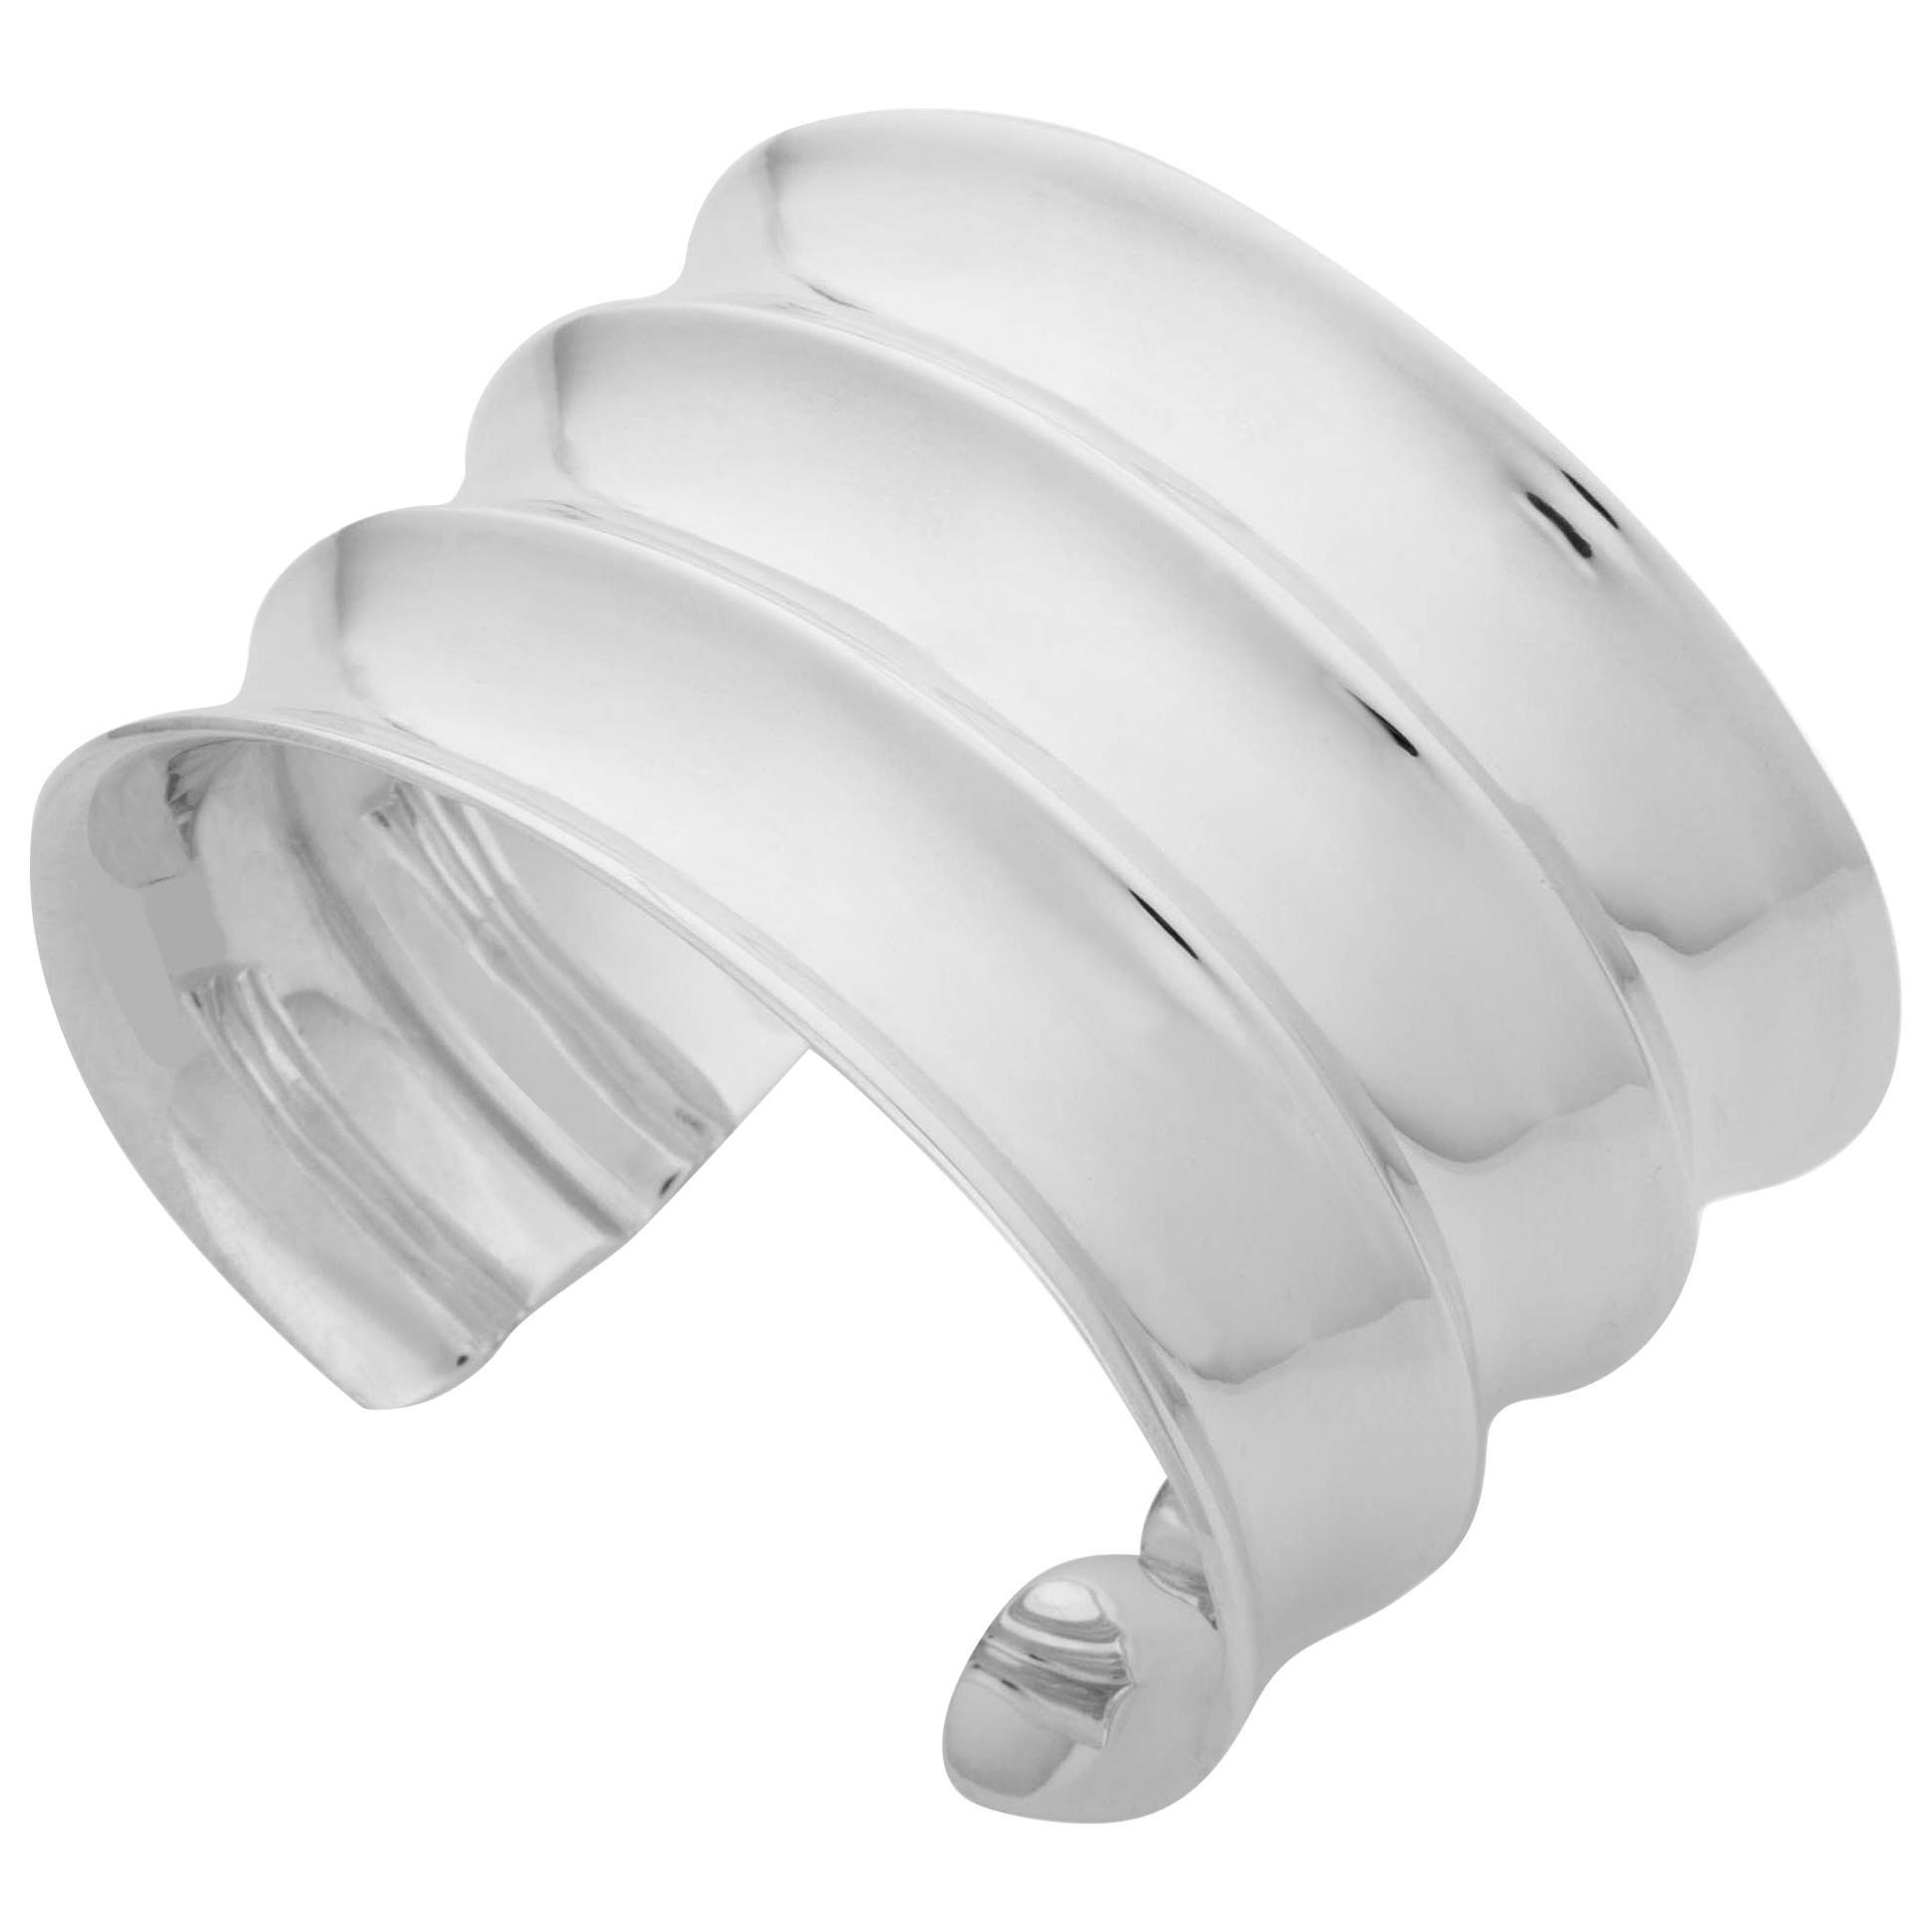 AGMES Sterling Silver Modern Sculptural Statement Cuff Bracelet